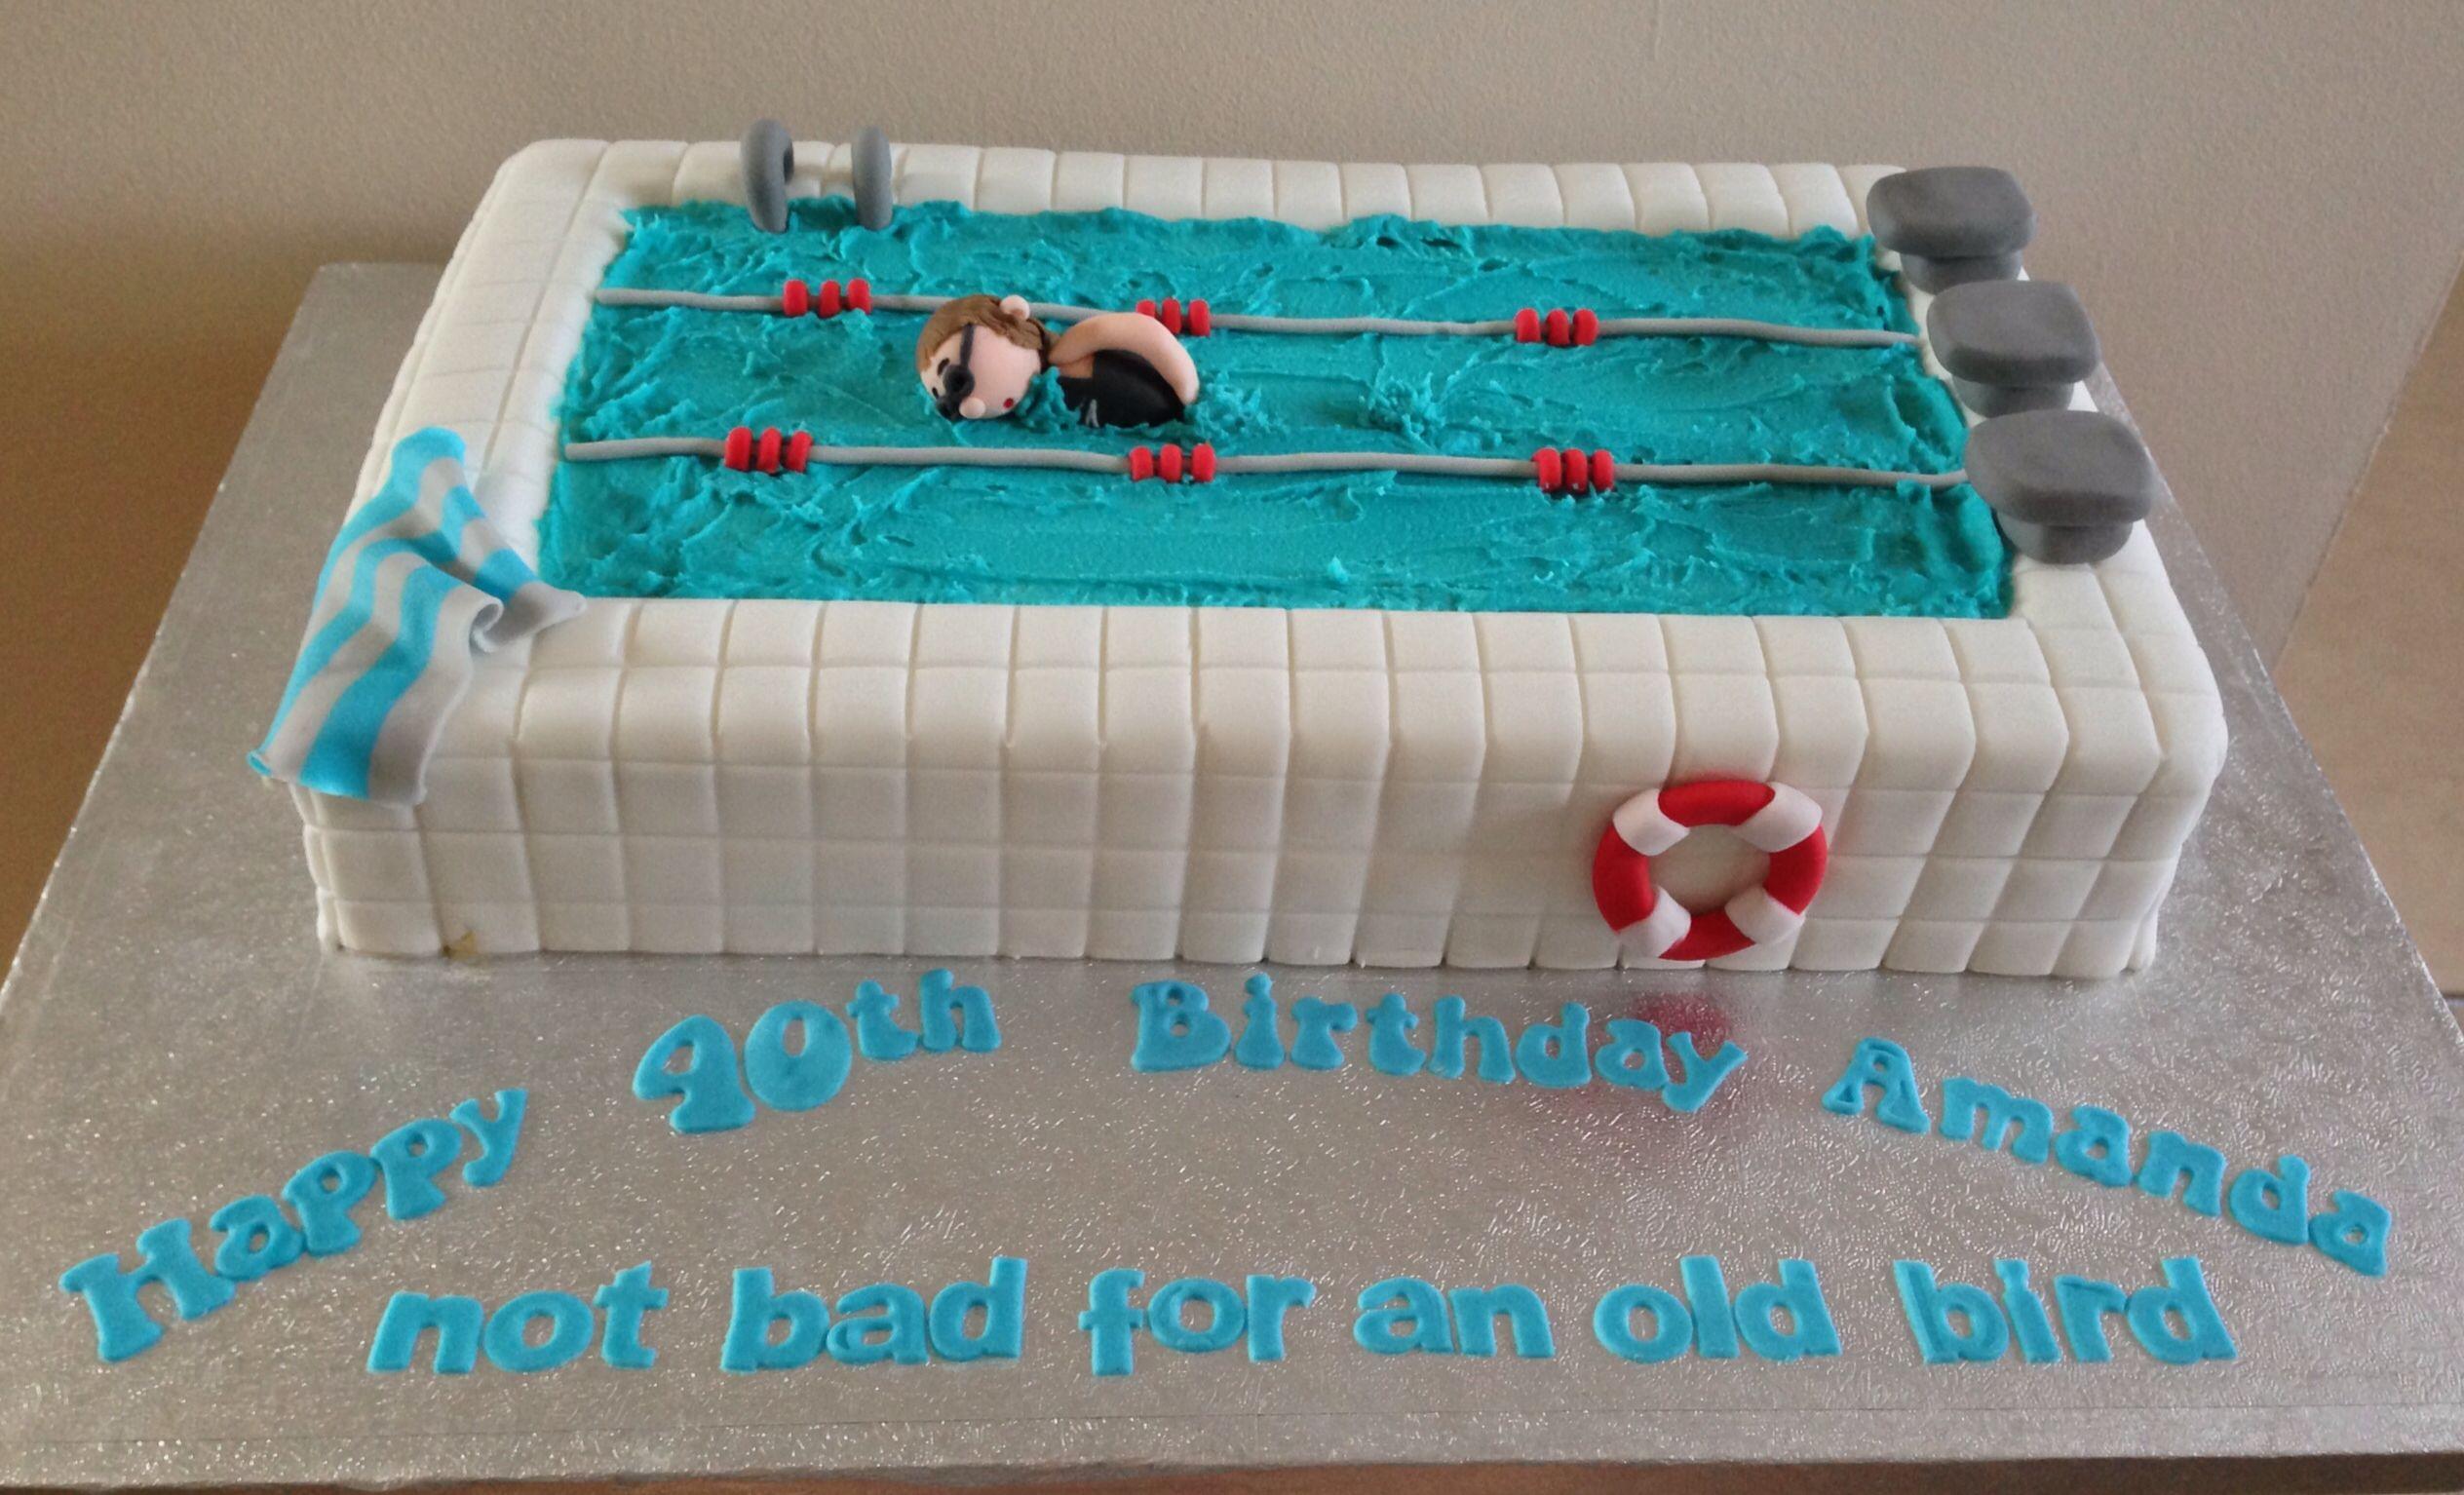 Swimming pool birthday cake cakes pinterest - Swimming pool birthday cake pictures ...